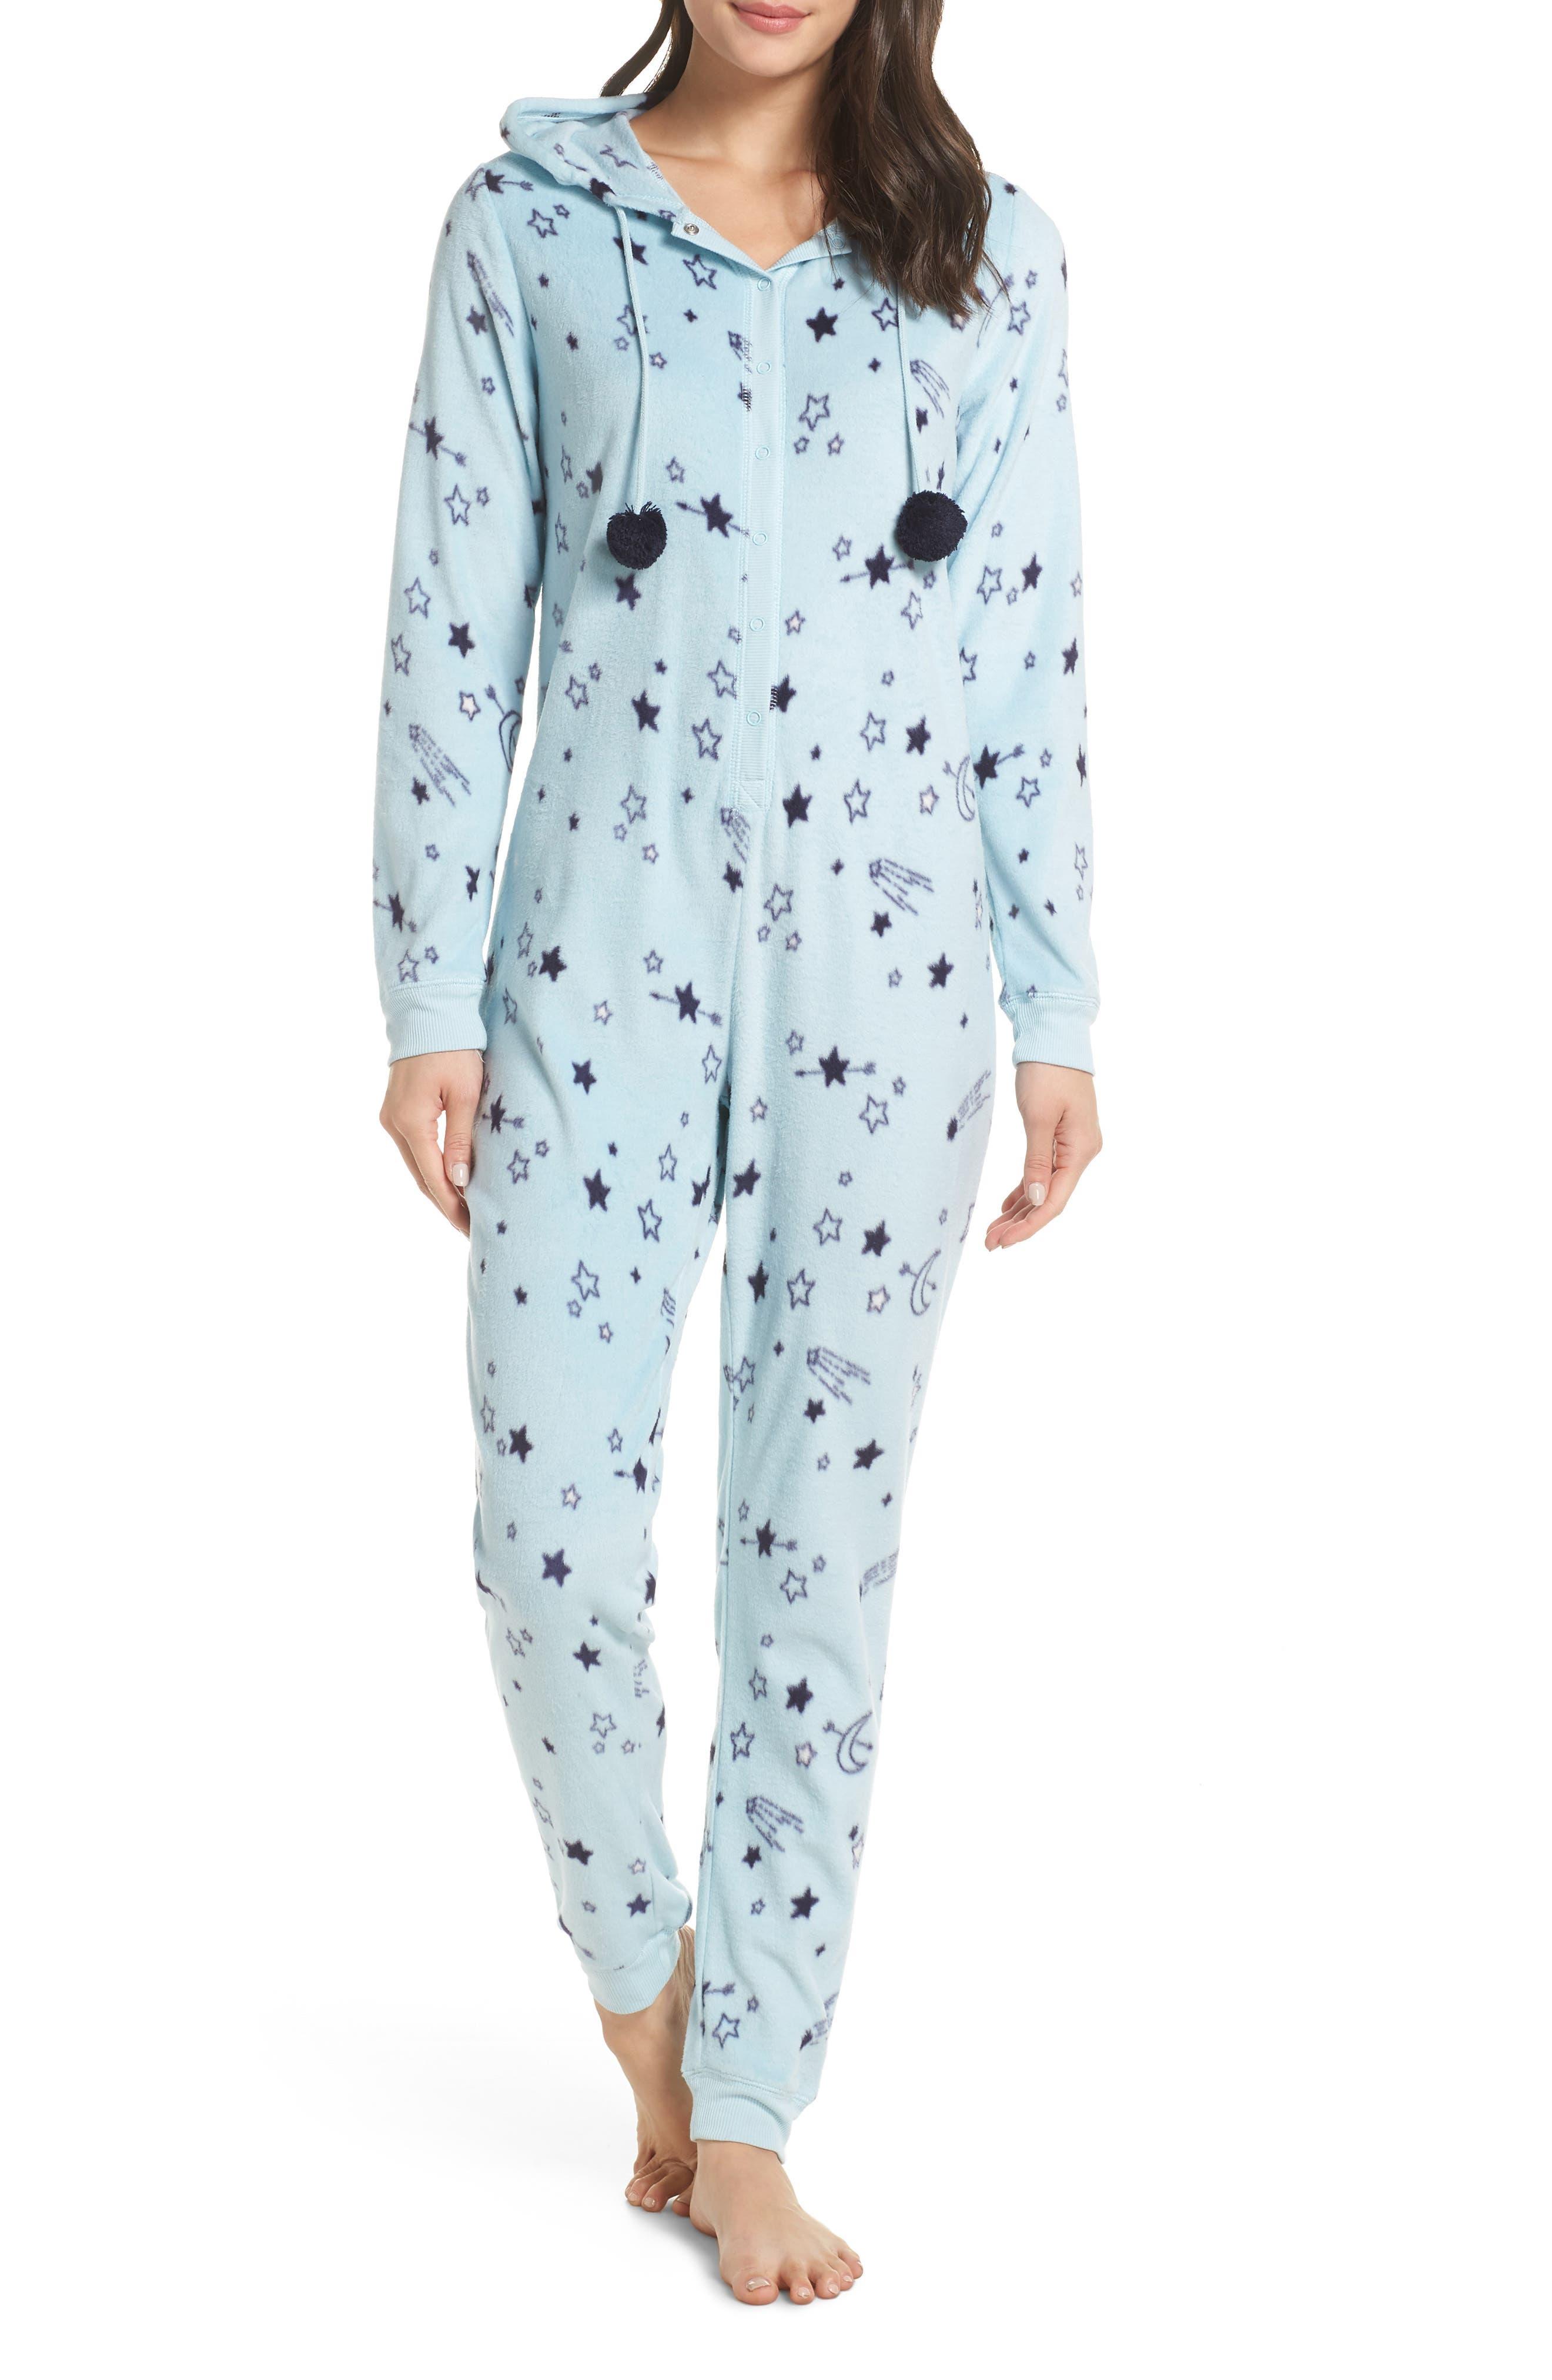 Hooded Pajama Jumpsuit,                             Main thumbnail 1, color,                             BLUE OMPHALODES SHOOT 4 STARS